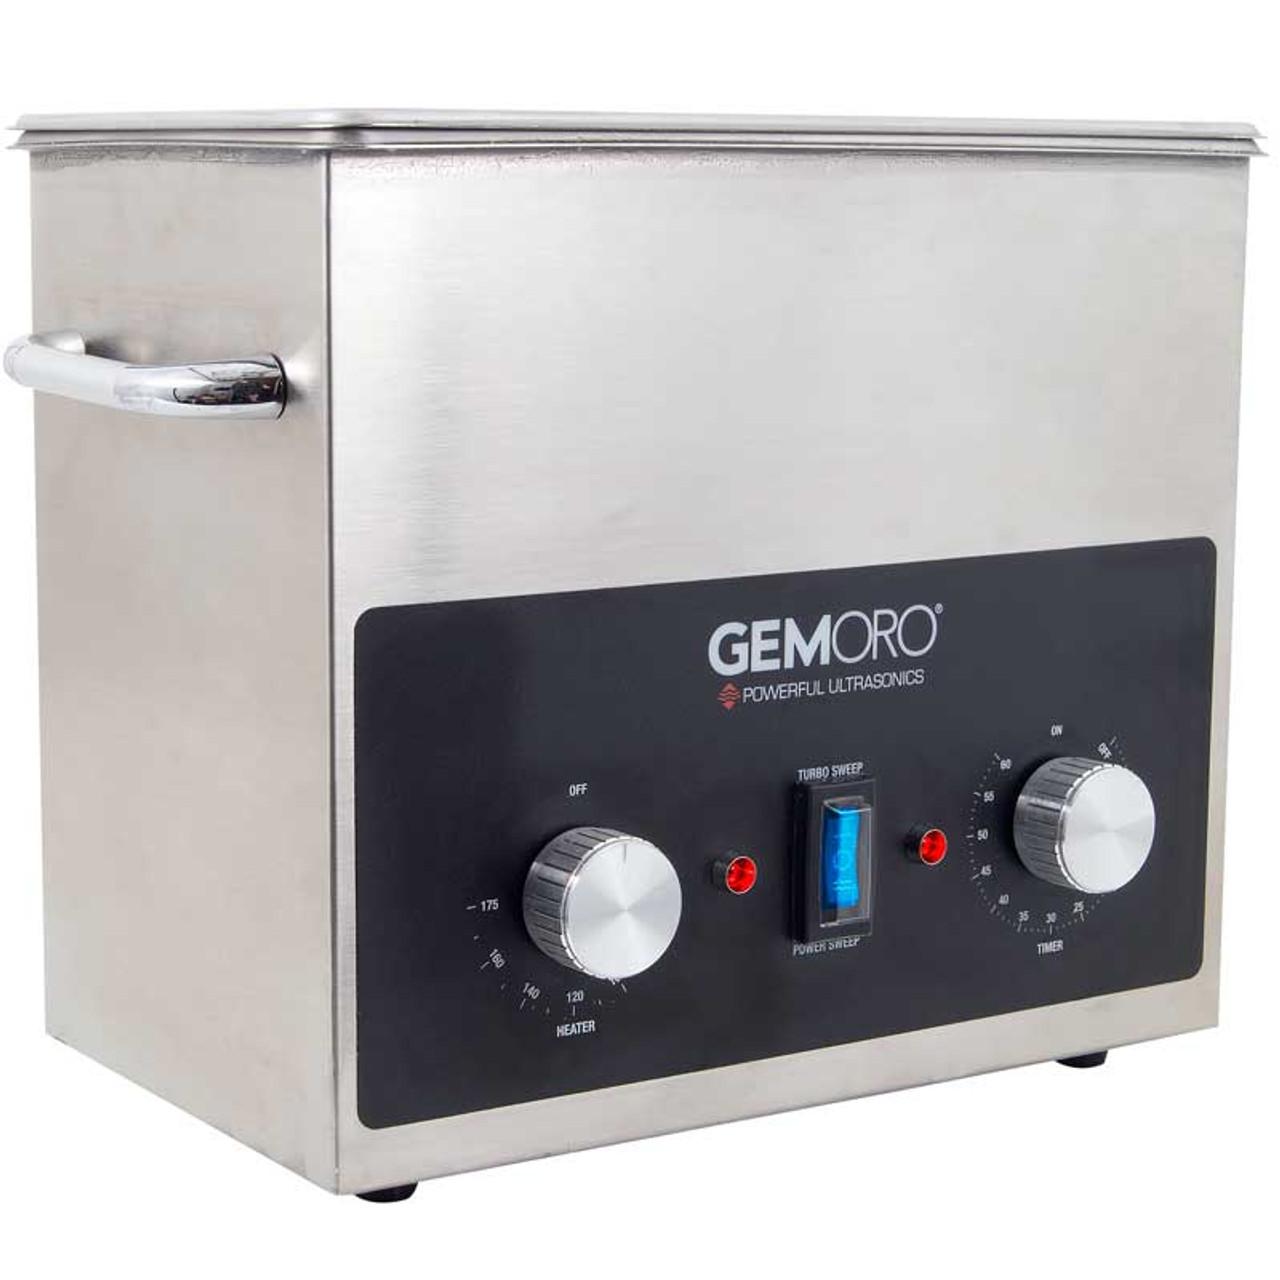 Gemoro Next Generation Ultrasonic Cleaner 3 Quart